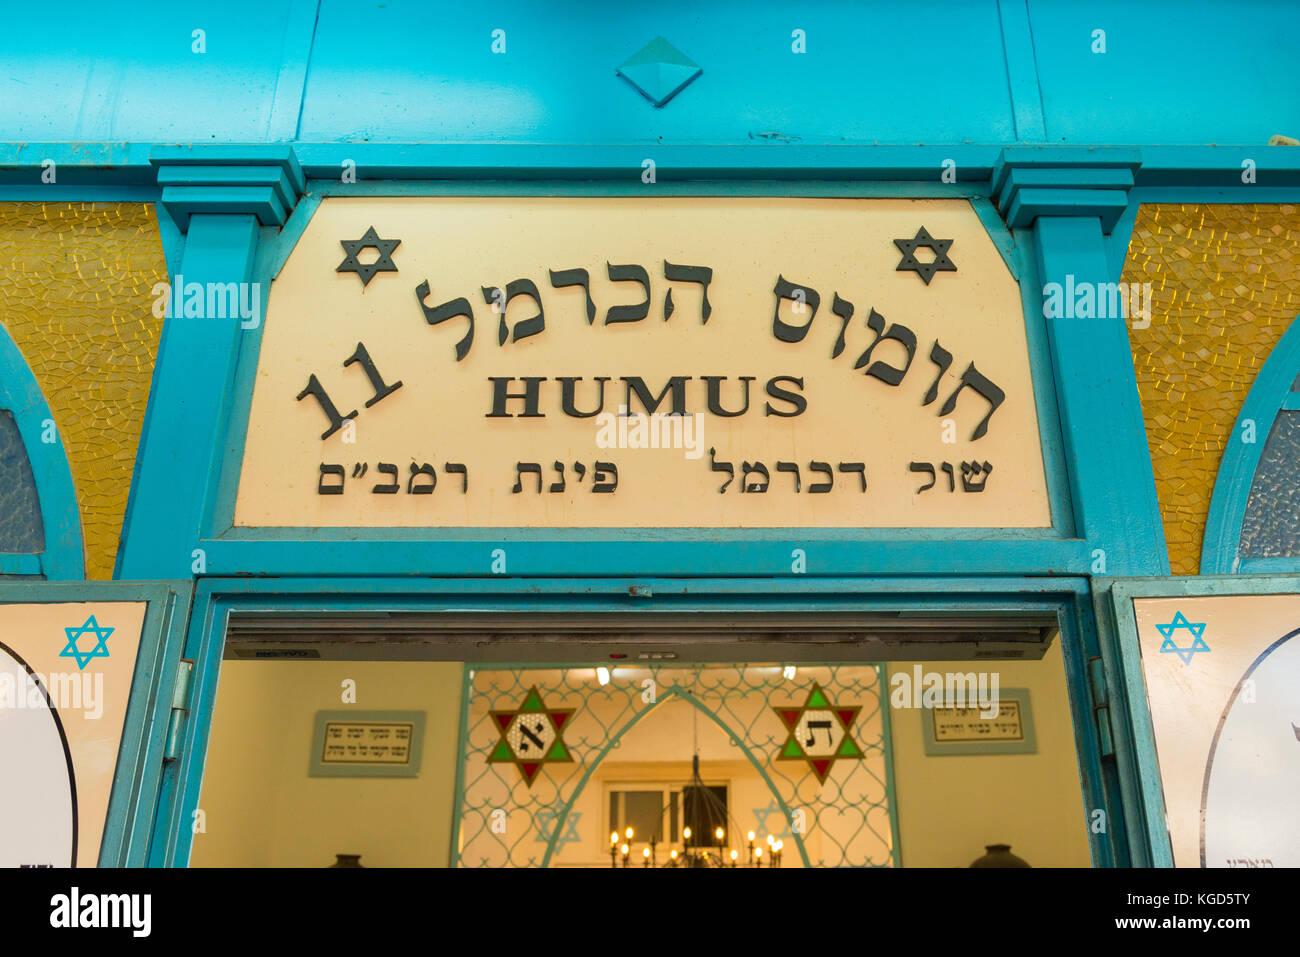 Israel The Holy Land Tel Aviv Carmel Market fabulous Humus HaCarmel fantasy decor like a Synagogue frontage entrance - Stock Image